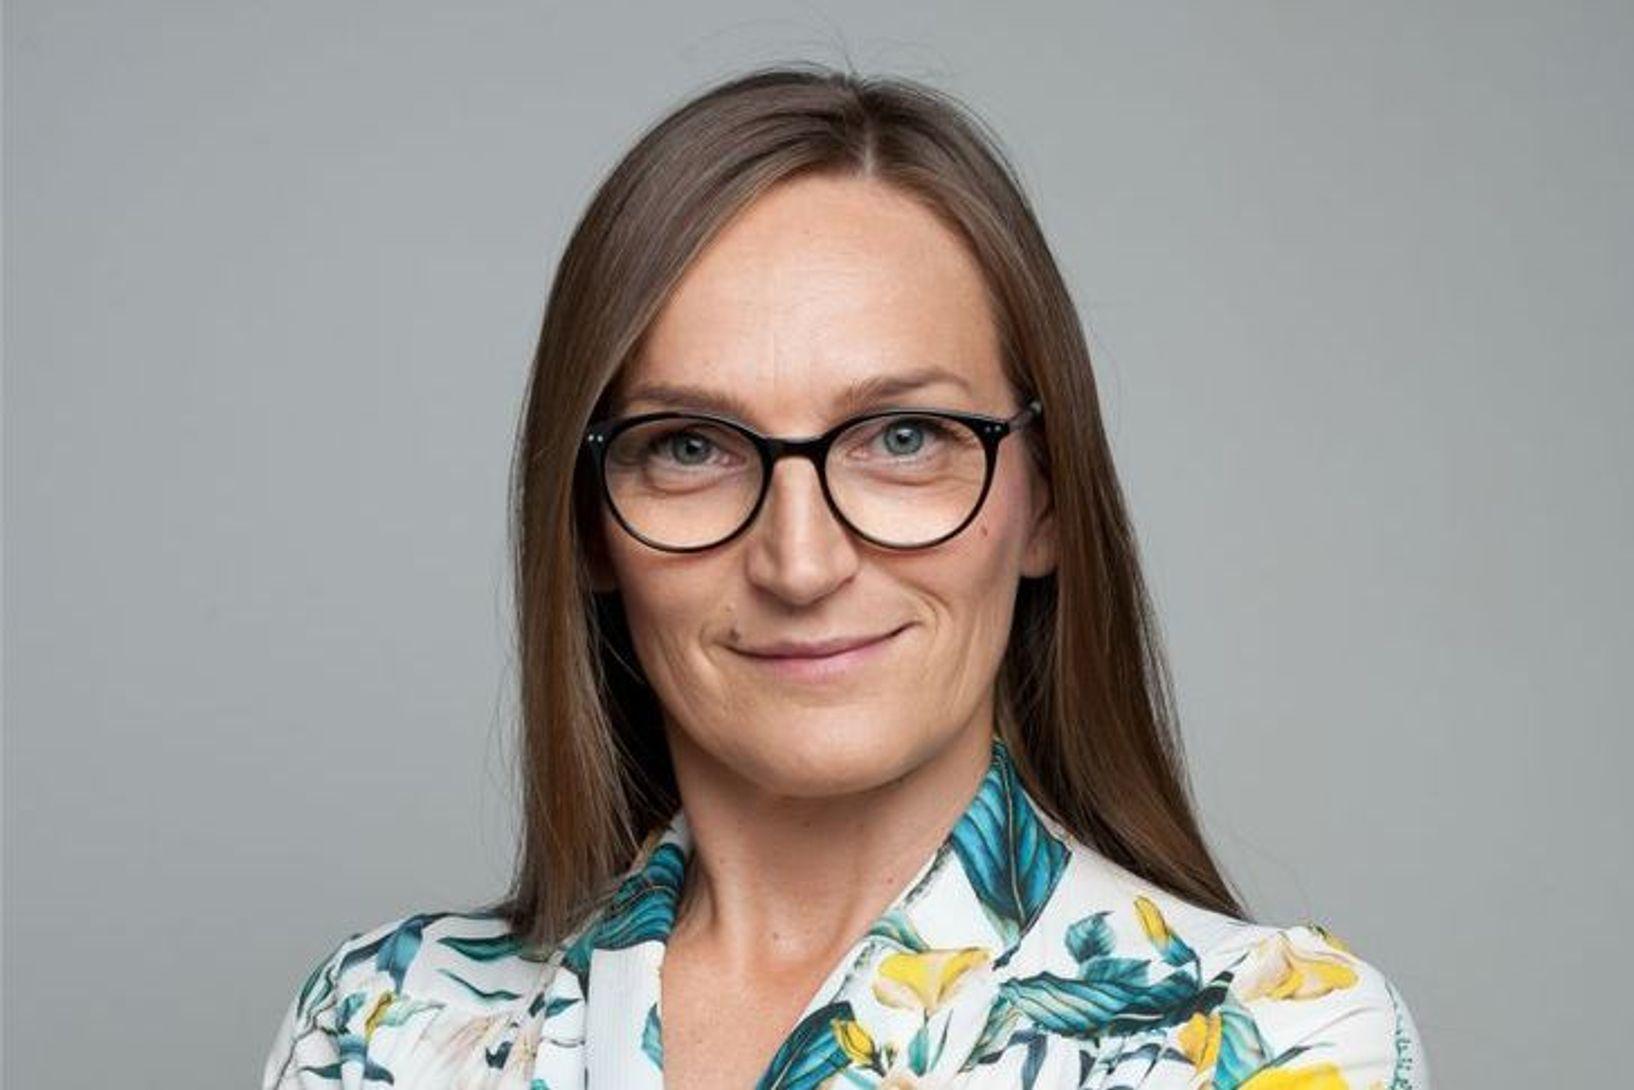 Sylwia Kowalska